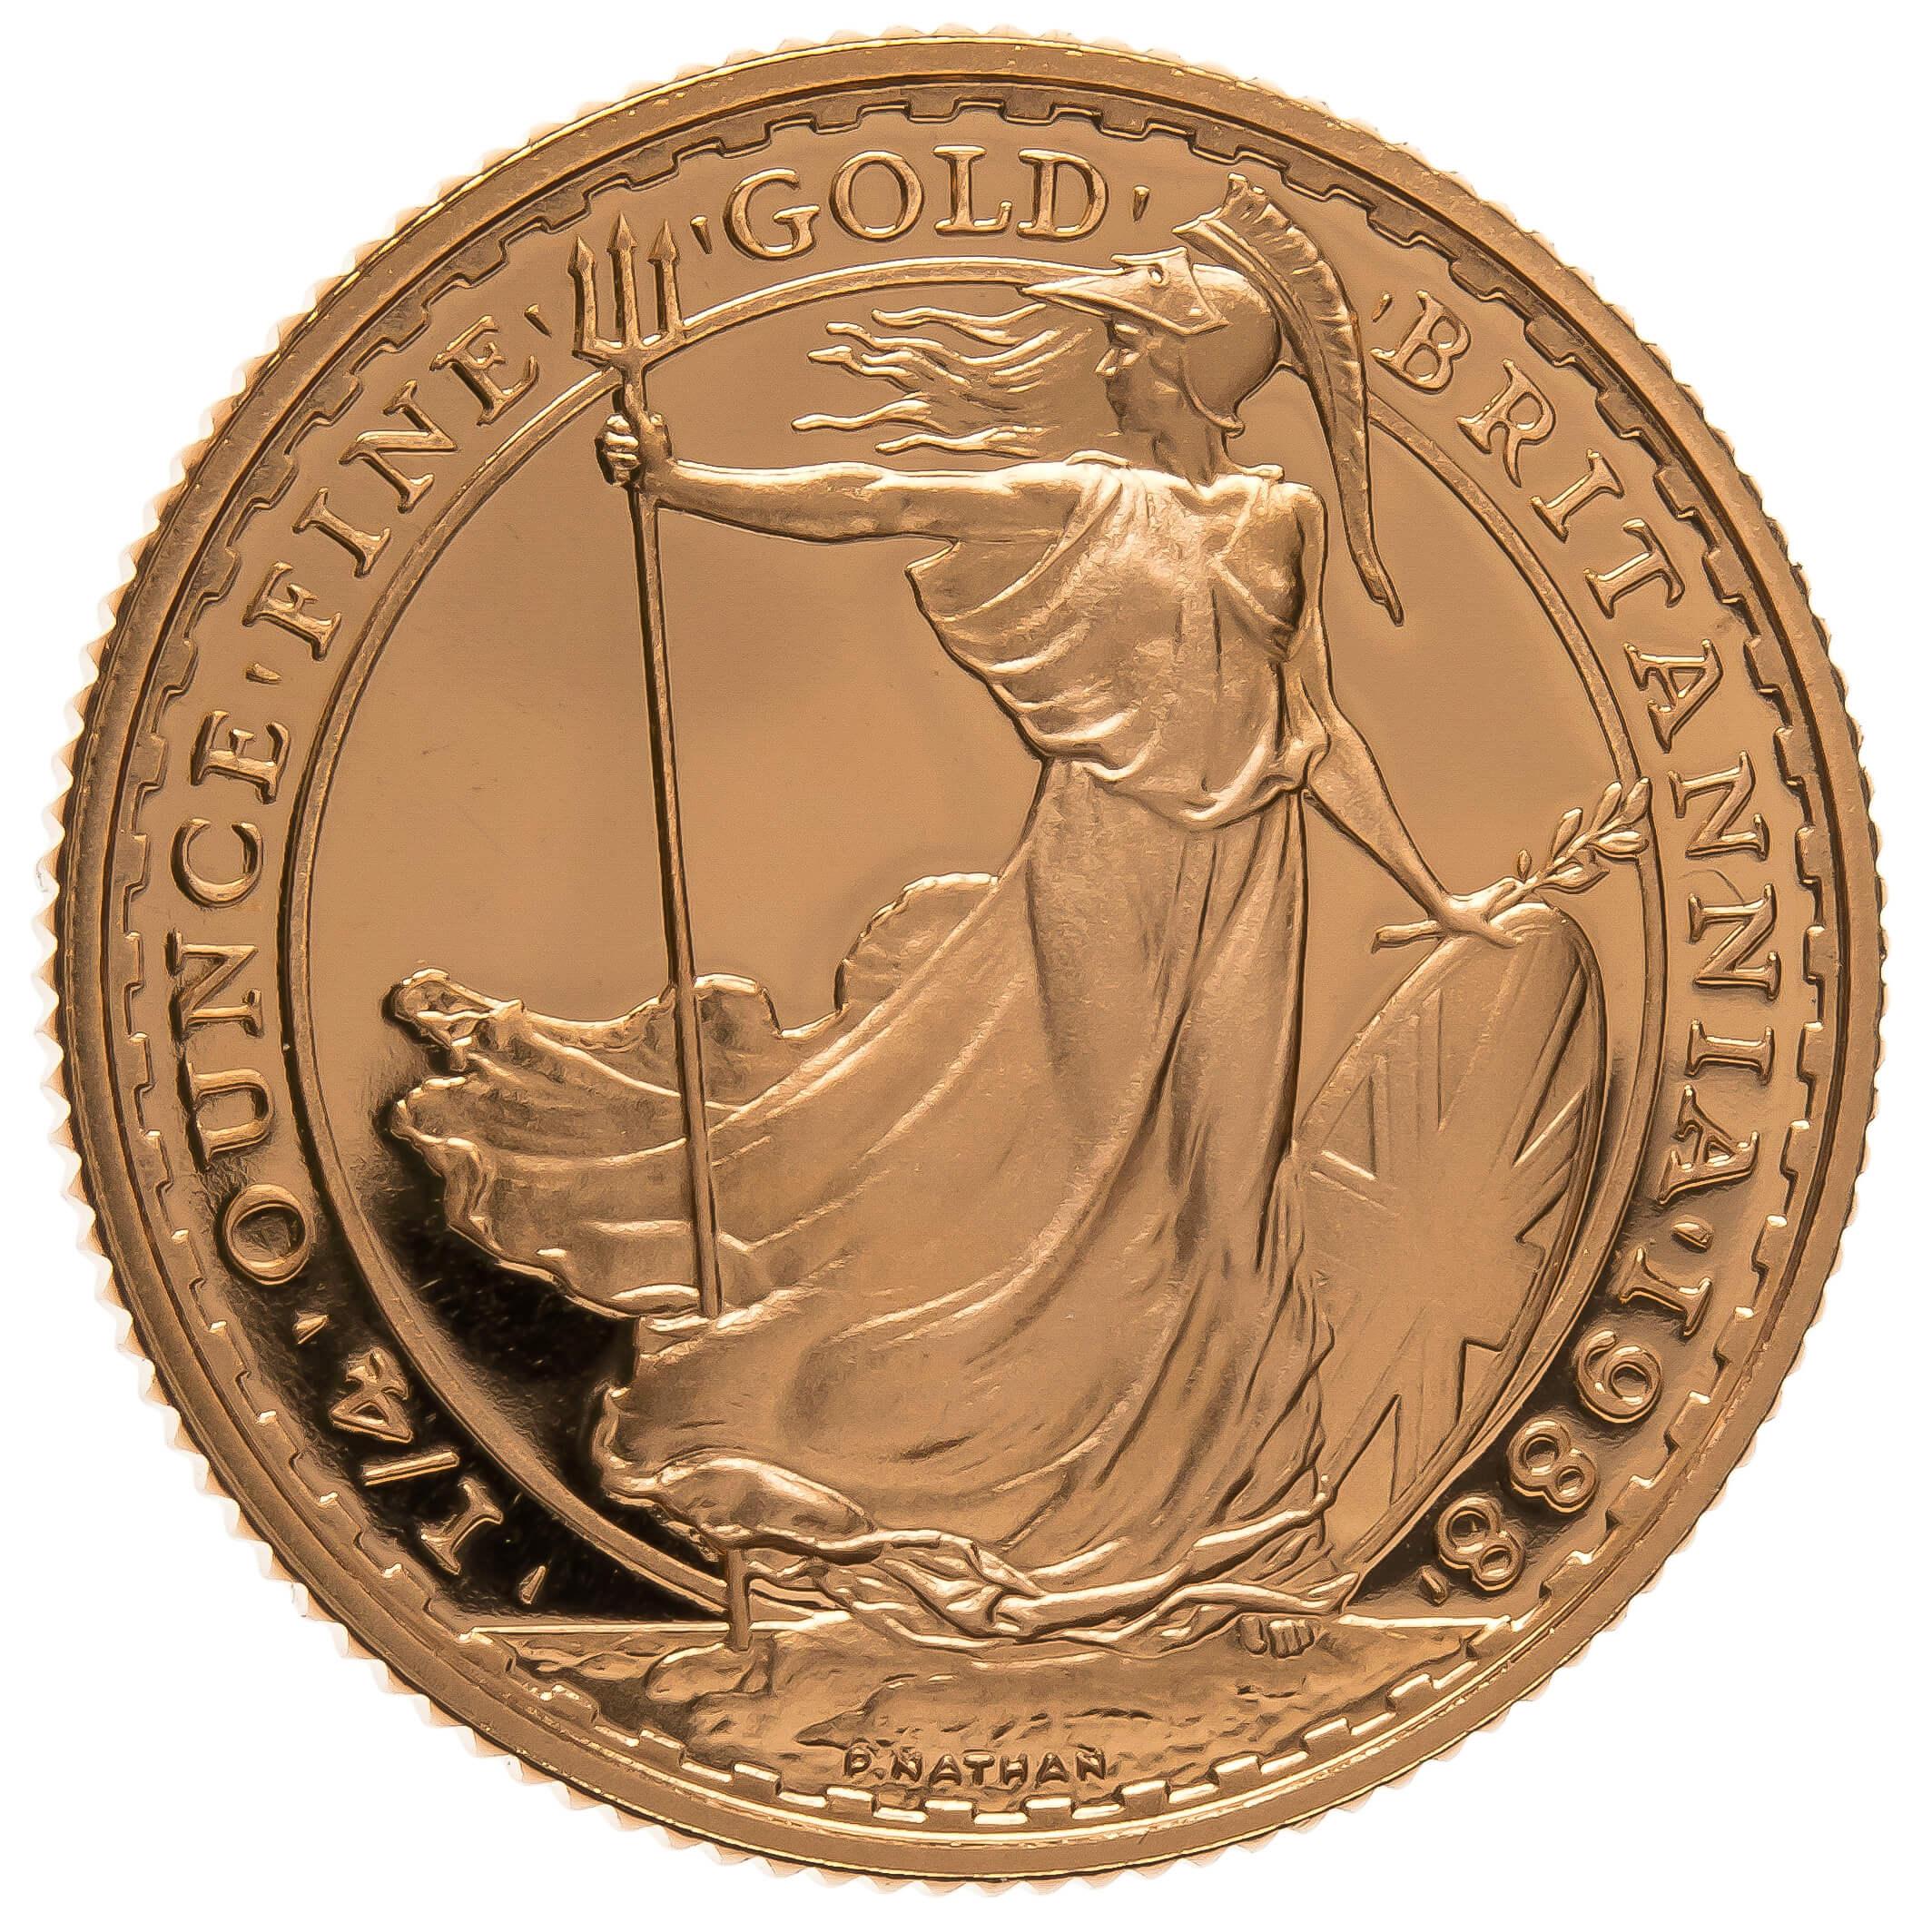 1988 Quarter Ounce Proof Britannia Gold Coin